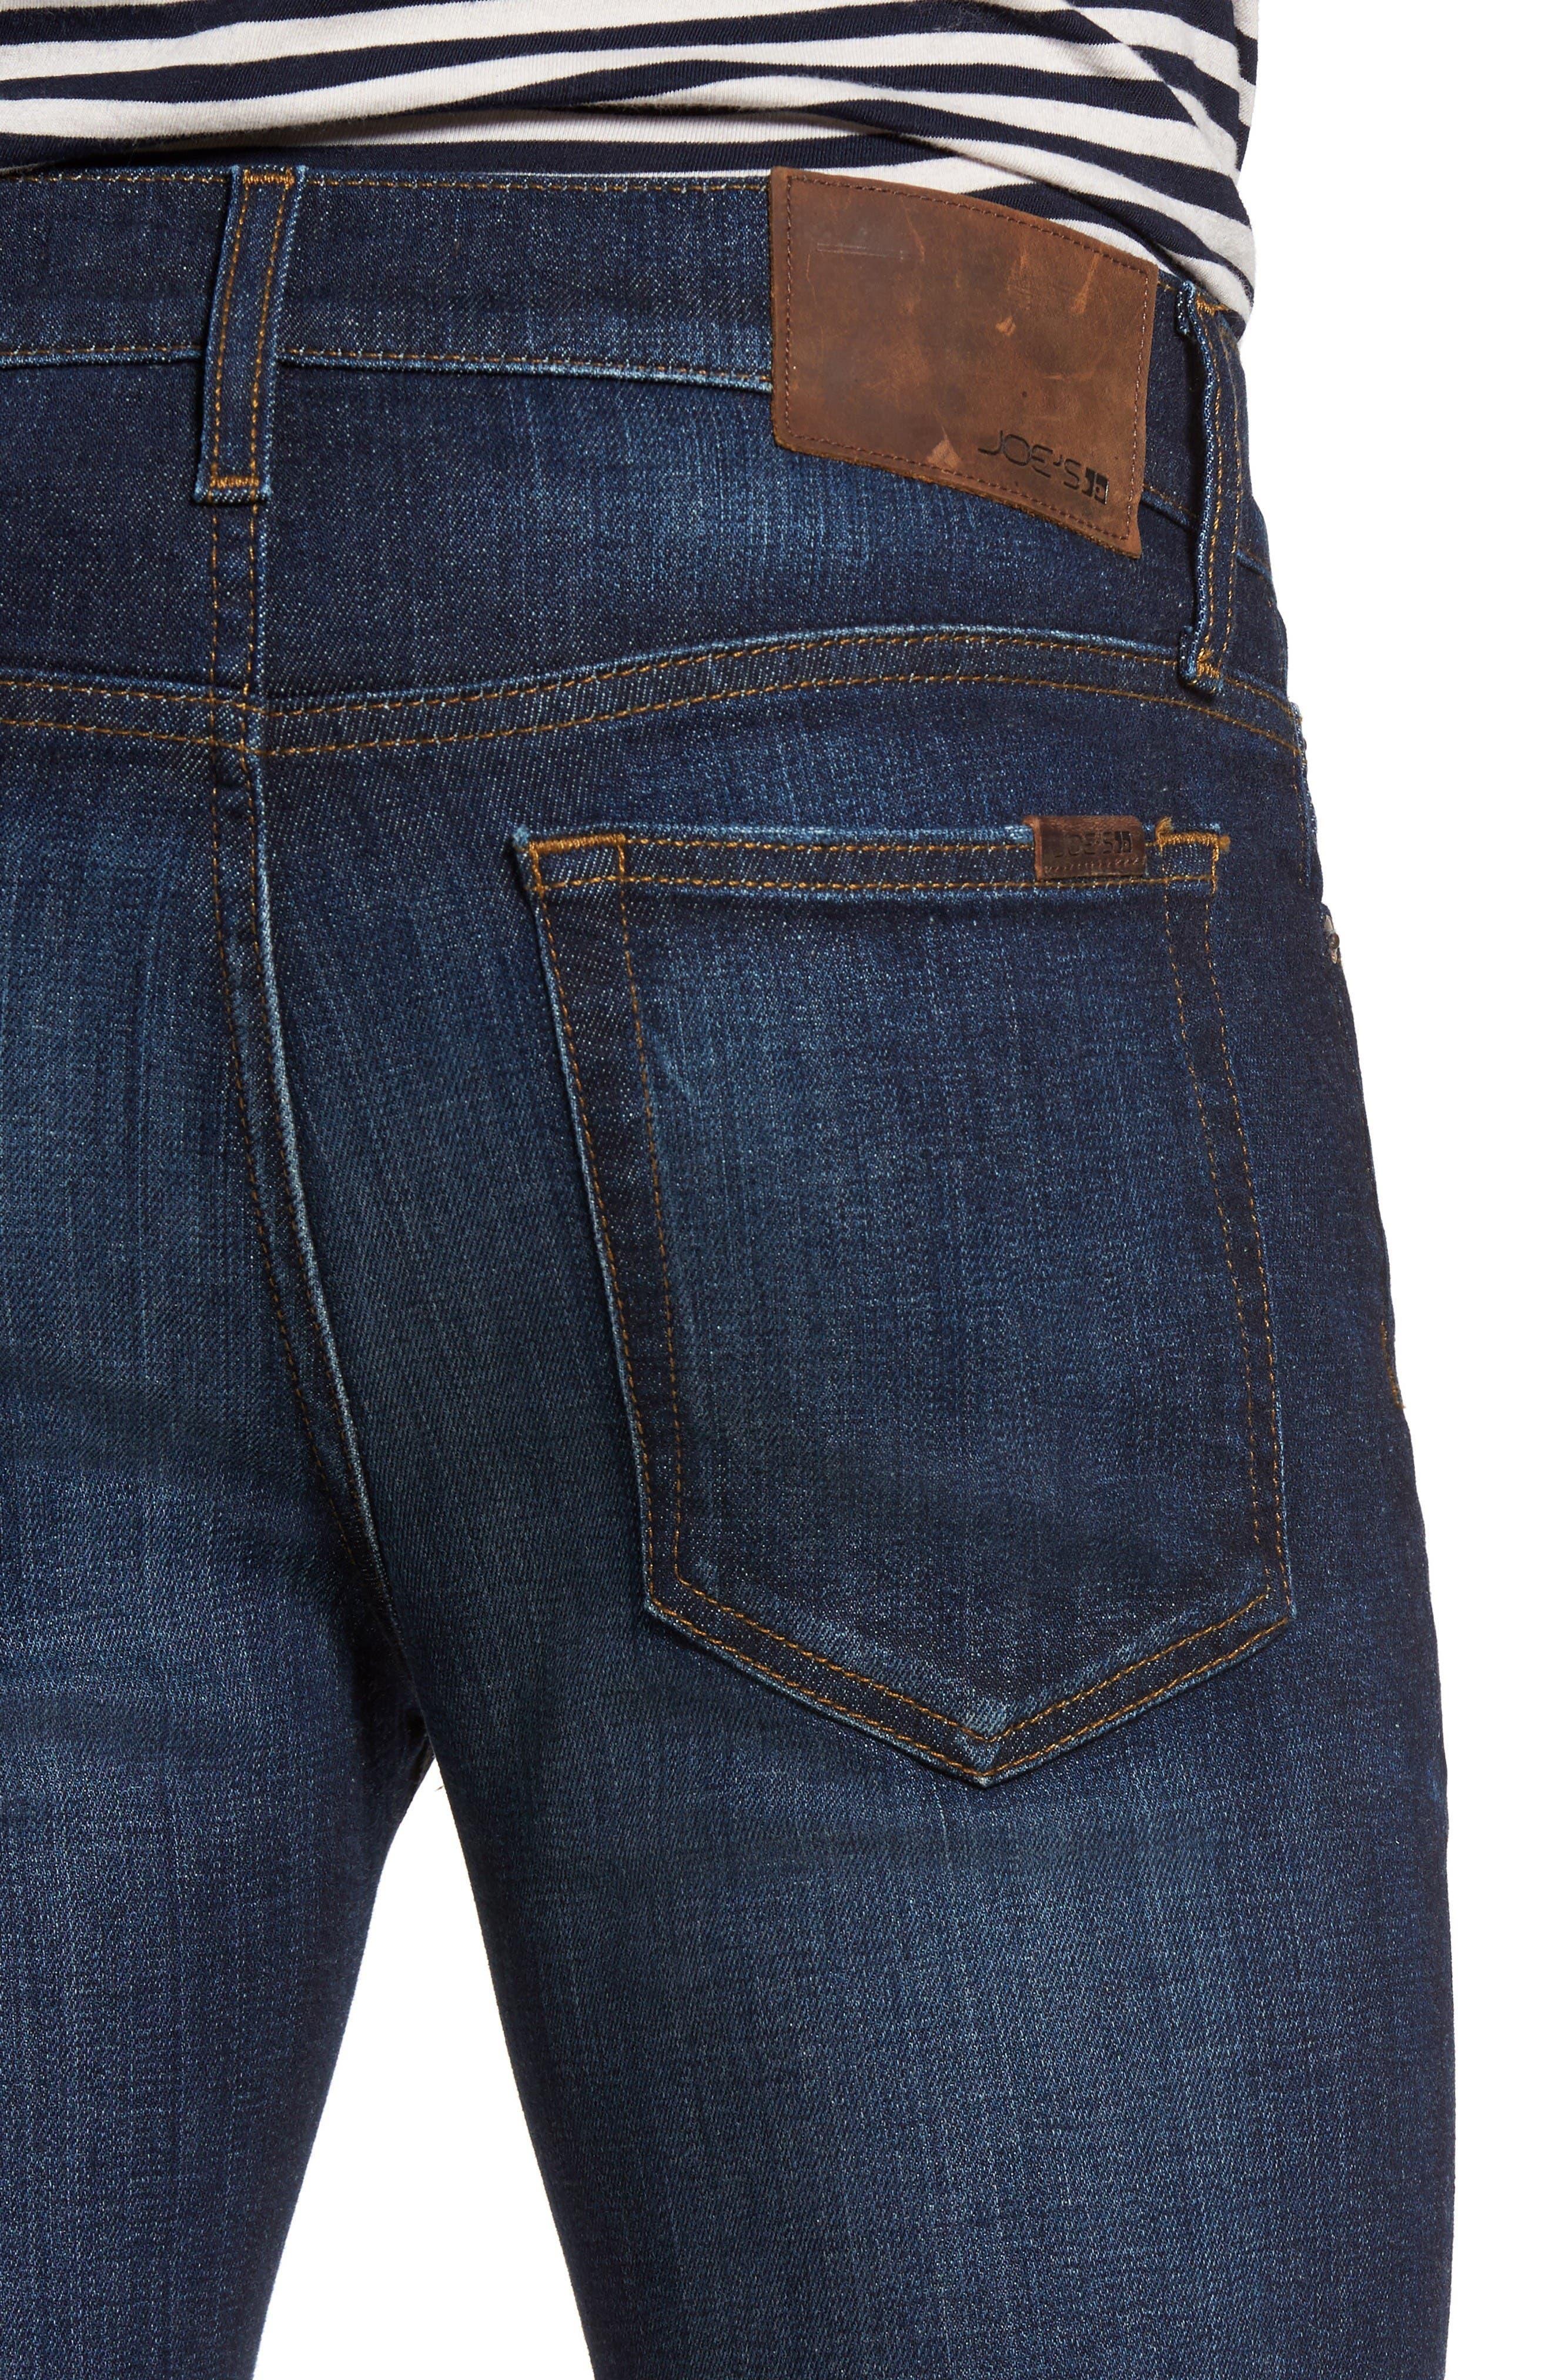 Classic Straight Leg Jeans,                             Alternate thumbnail 4, color,                             Montoya